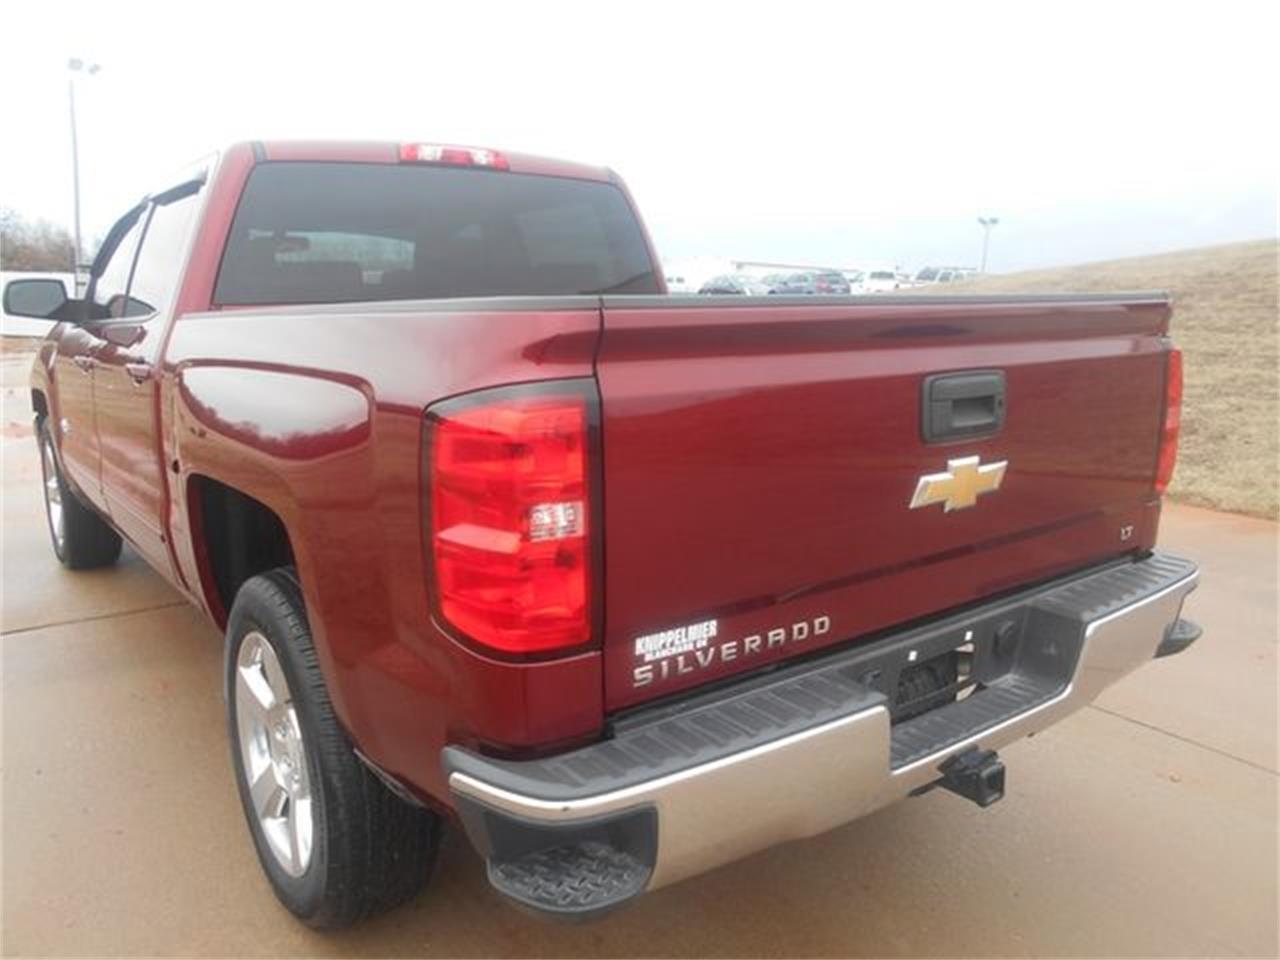 2017 Chevrolet Silverado (CC-1069817) for sale in Blanchard, Oklahoma